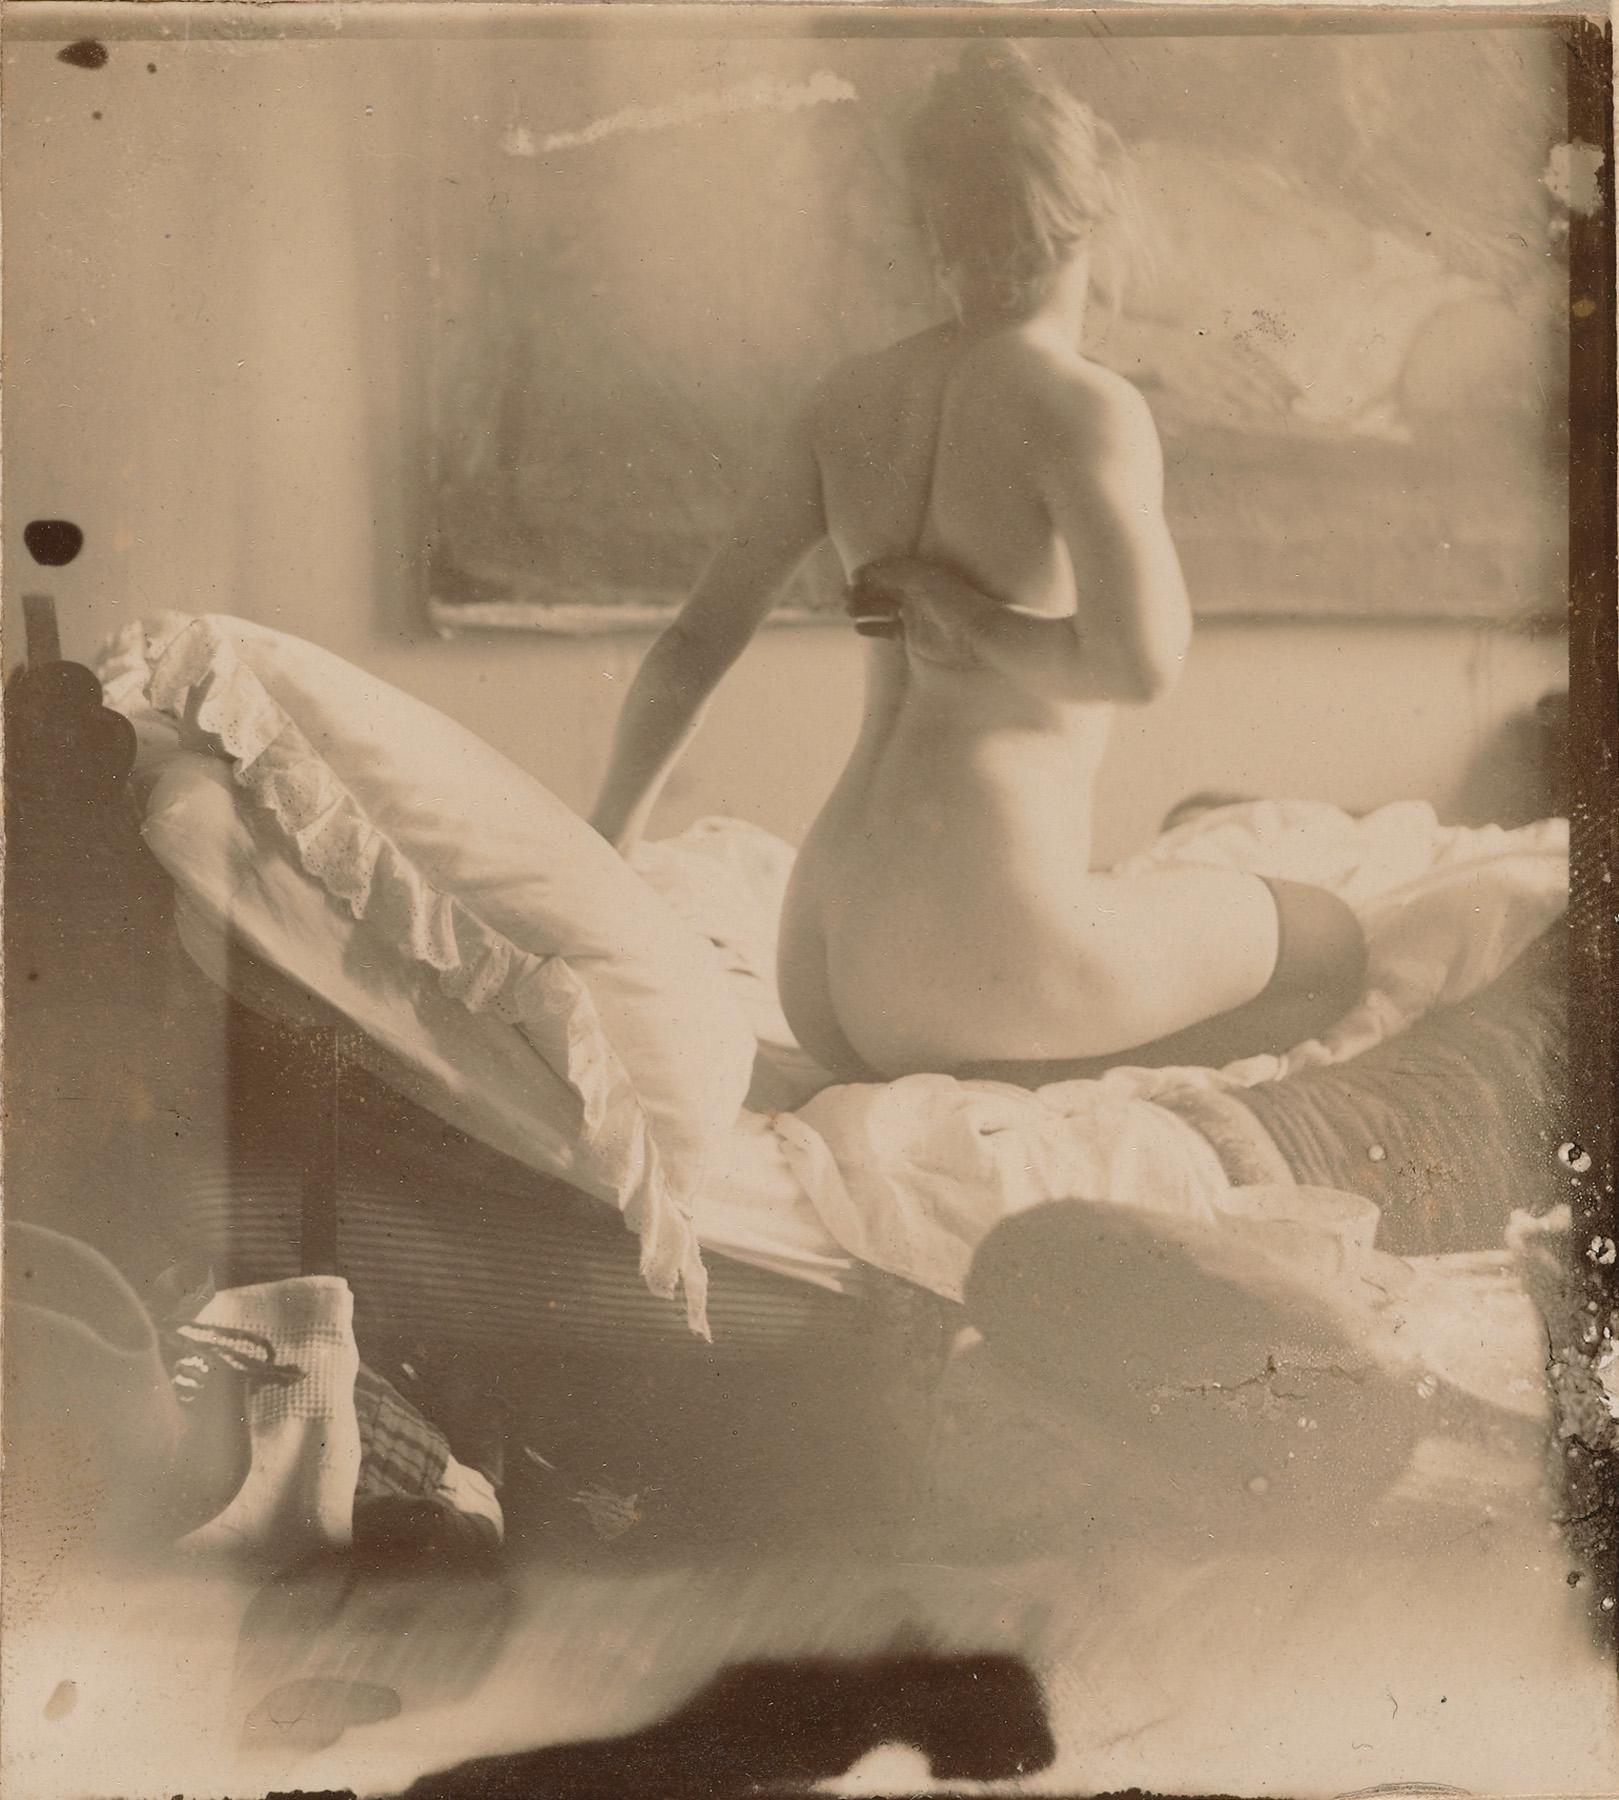 George Hendrik Breitner, Marie Jordan von hinten gesehen, 1890. Rijksmuseum, Amsterdam